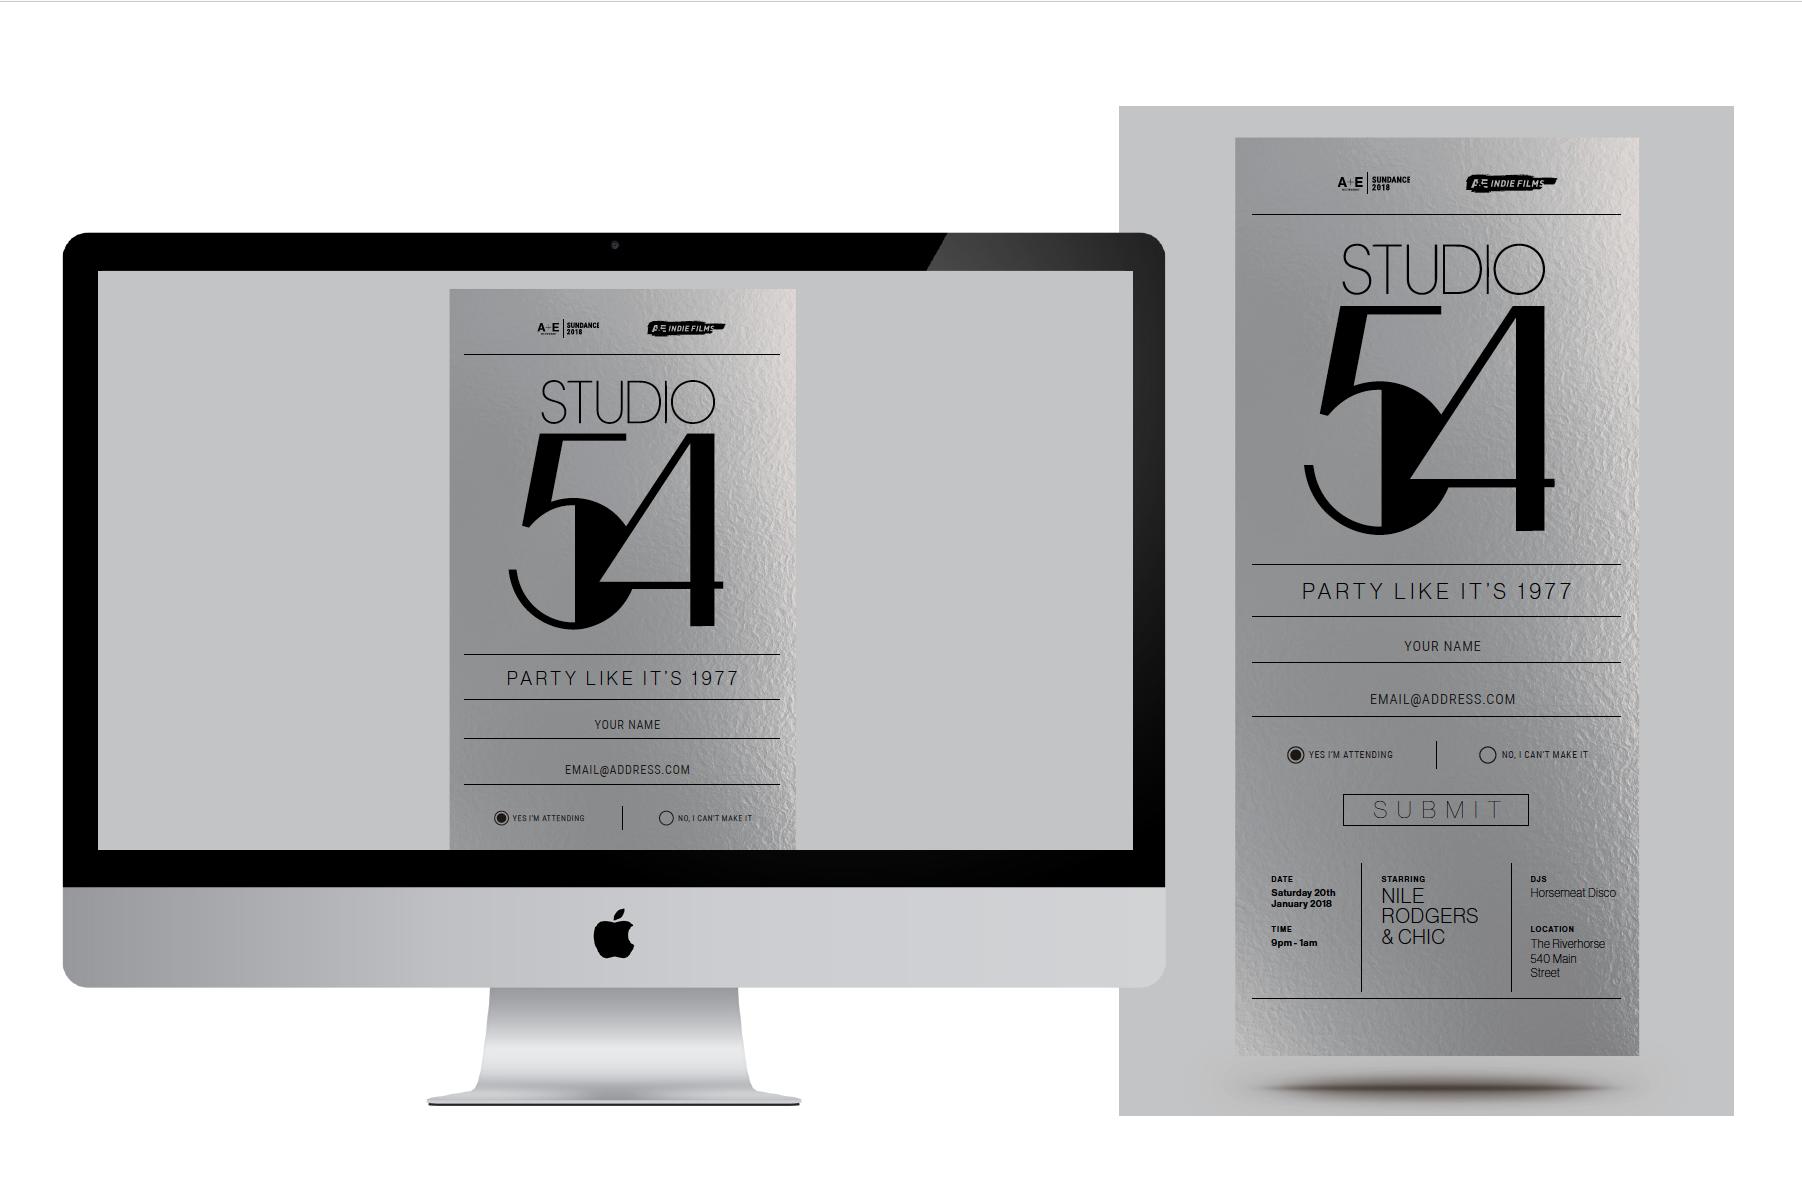 A&E Indie Films Studio 54 party digital invite design